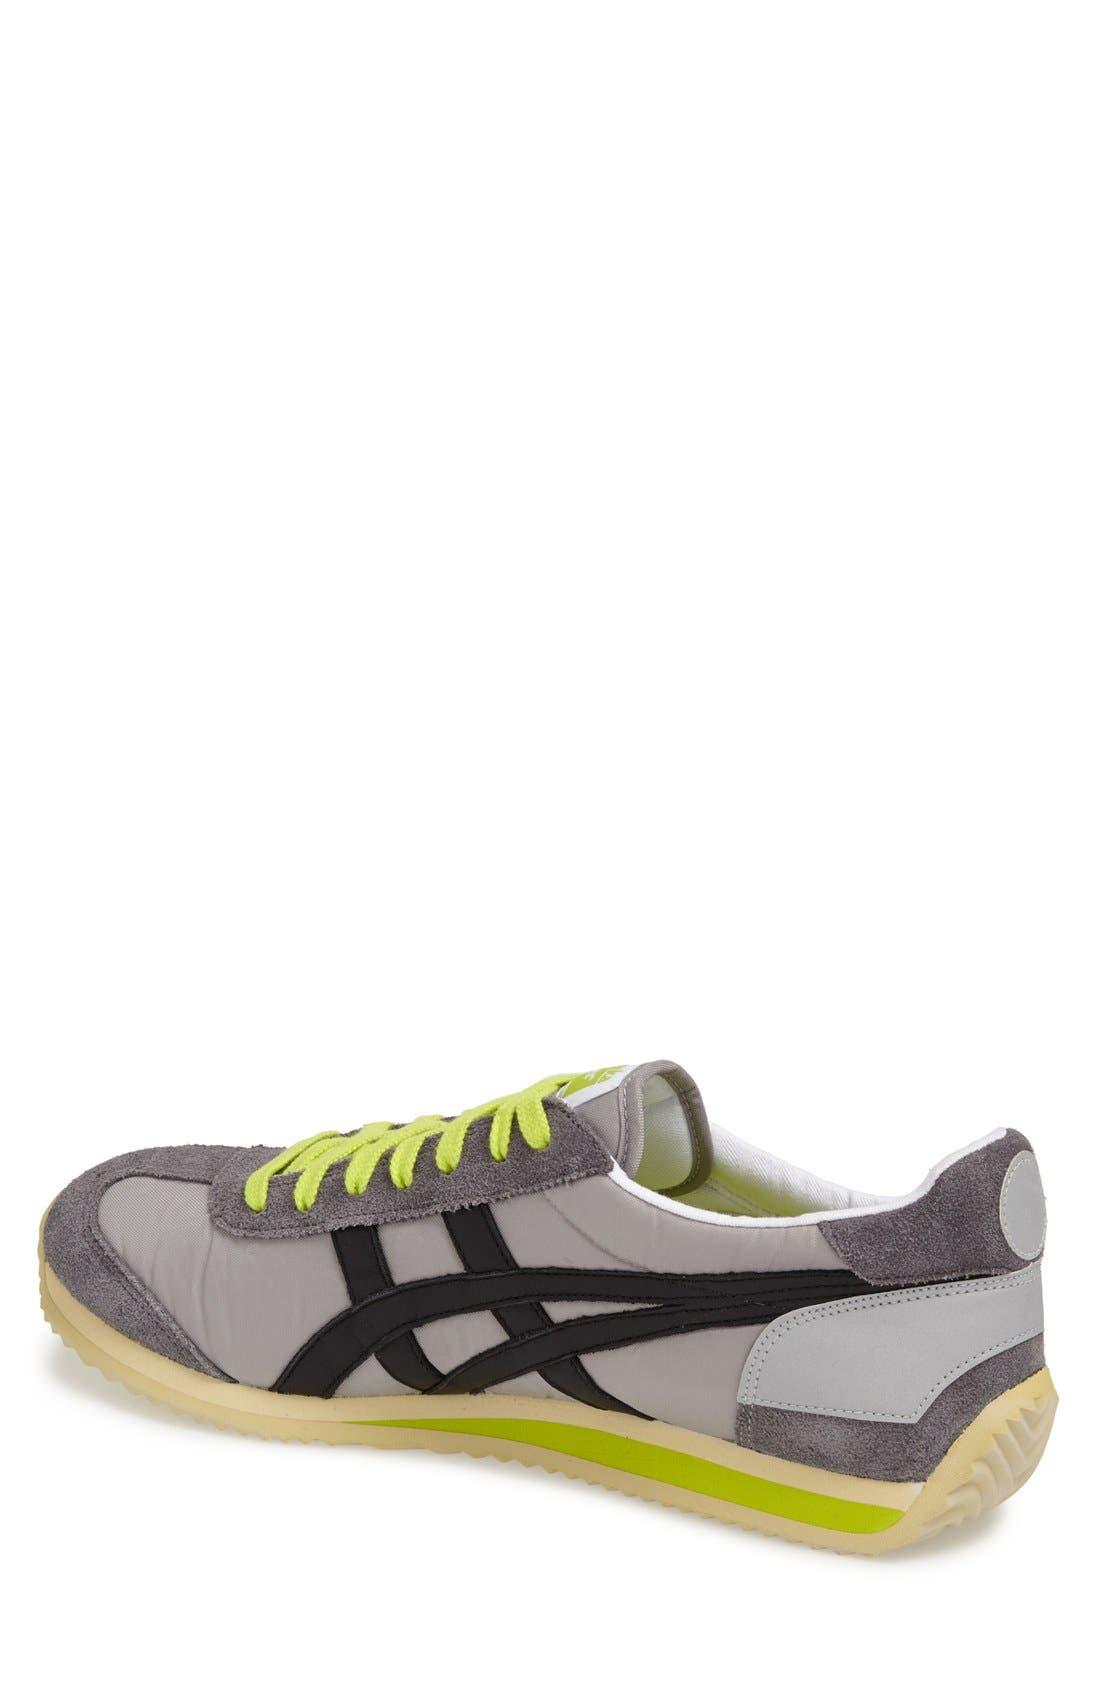 Alternate Image 3  - Onitsuka Tiger™ 'California '78™ Vintage' Athletic Shoe